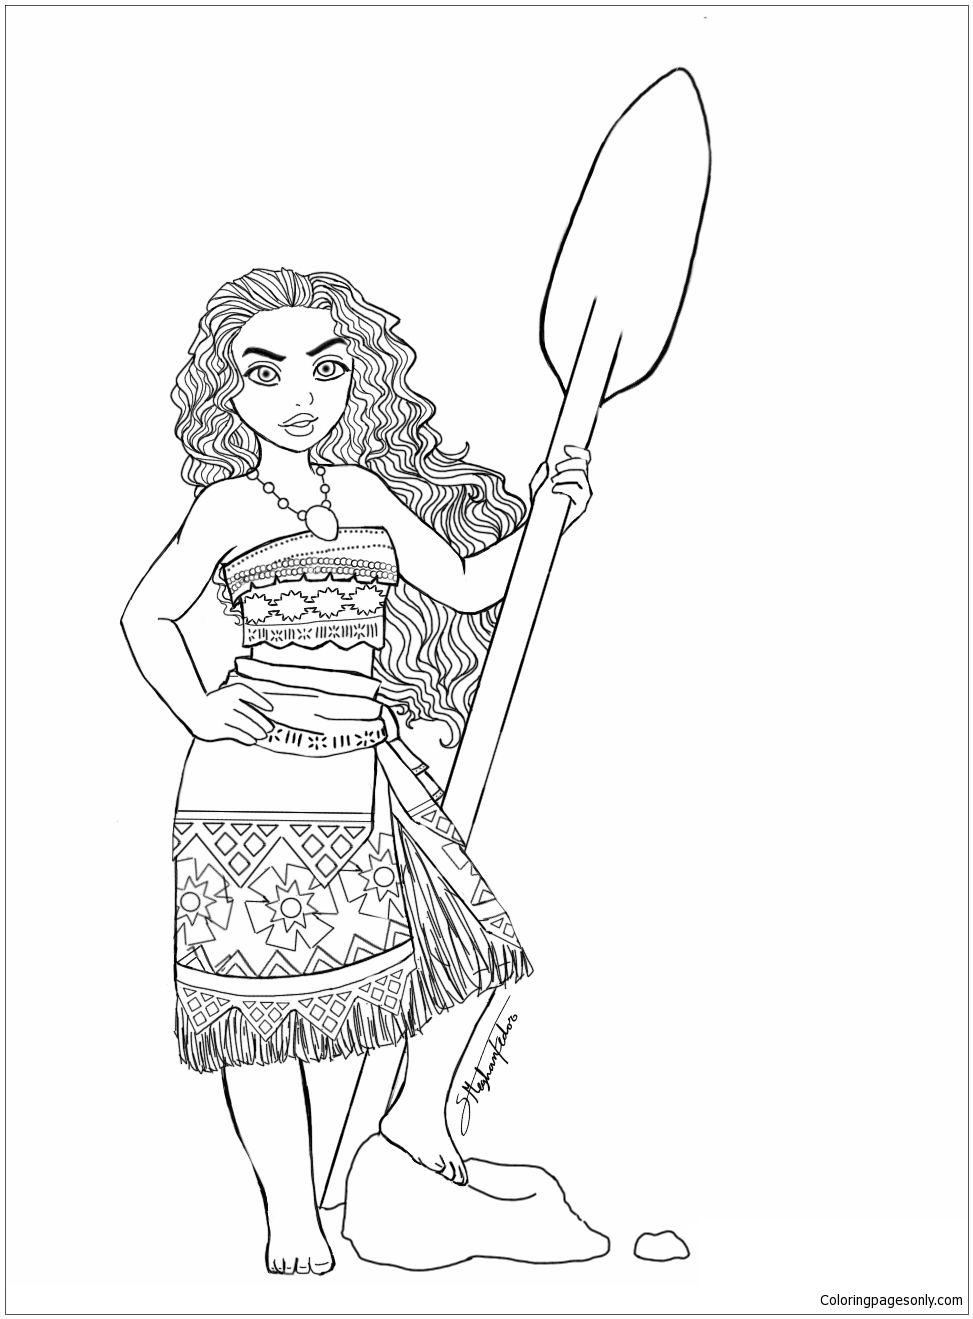 Moana Princess 7 Coloring Page Moana Coloring Moana Coloring Pages Coloring Pages